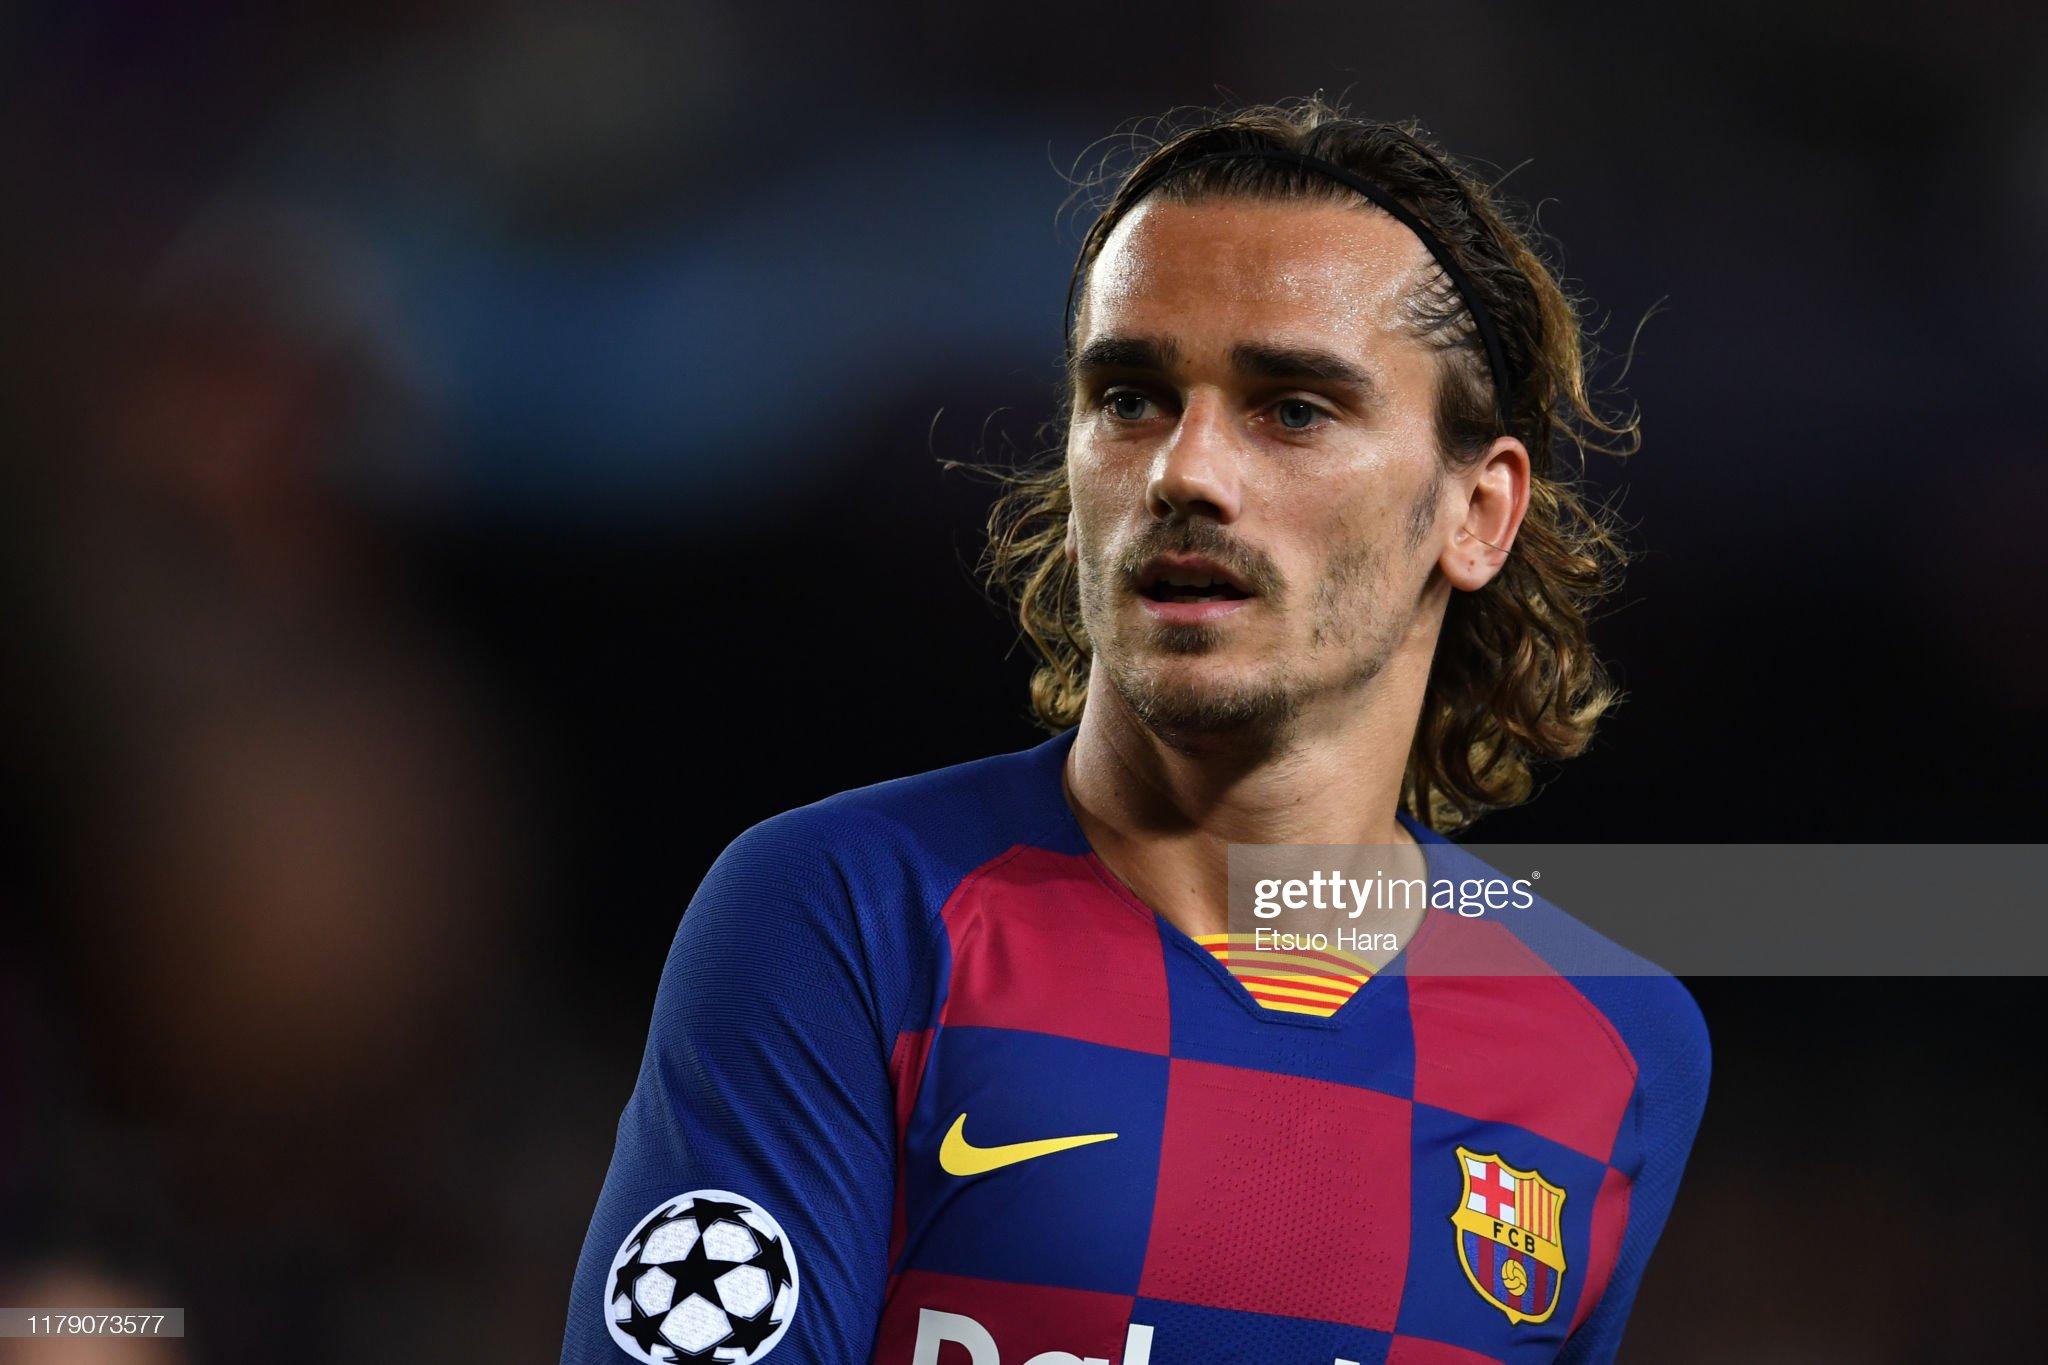 صور مباراة : برشلونة - إنتر 2-1 ( 02-10-2019 )  Antoine-griezmann-of-fc-barcelona-looks-on-during-the-uefa-champions-picture-id1179073577?s=2048x2048